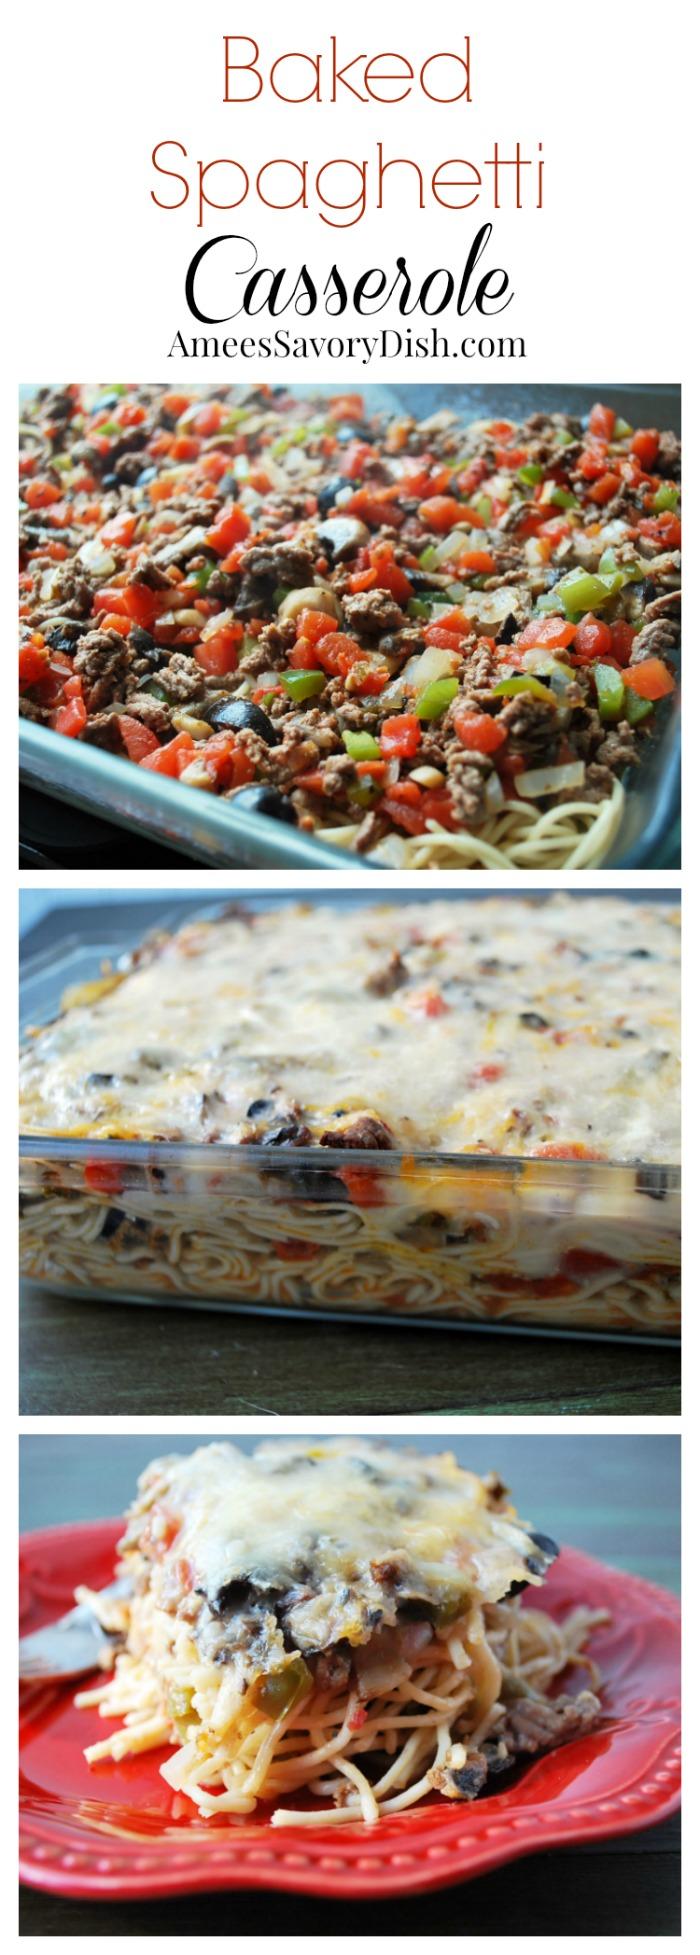 Baked Spaghetti Casserole Collage